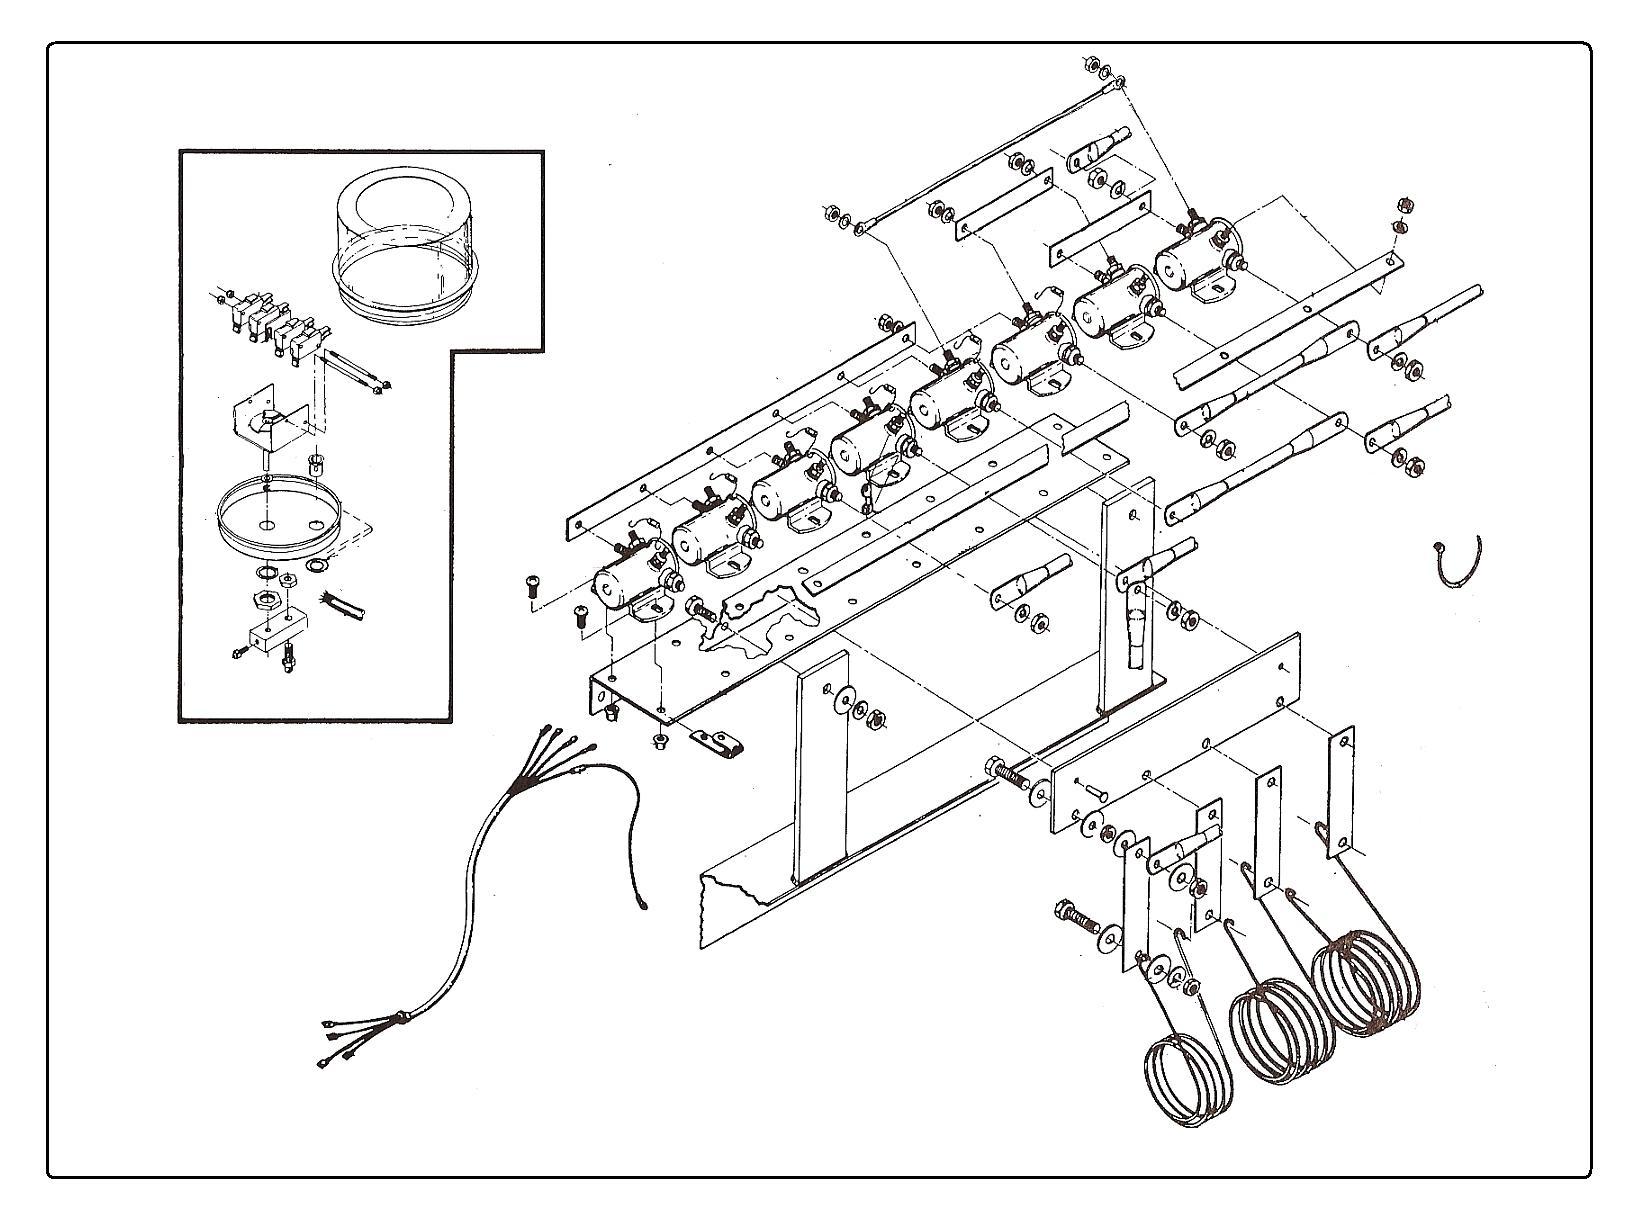 club car fuse box diagram sk 1381  golf cart 48v battery wiring diagram moreover club car  golf cart 48v battery wiring diagram